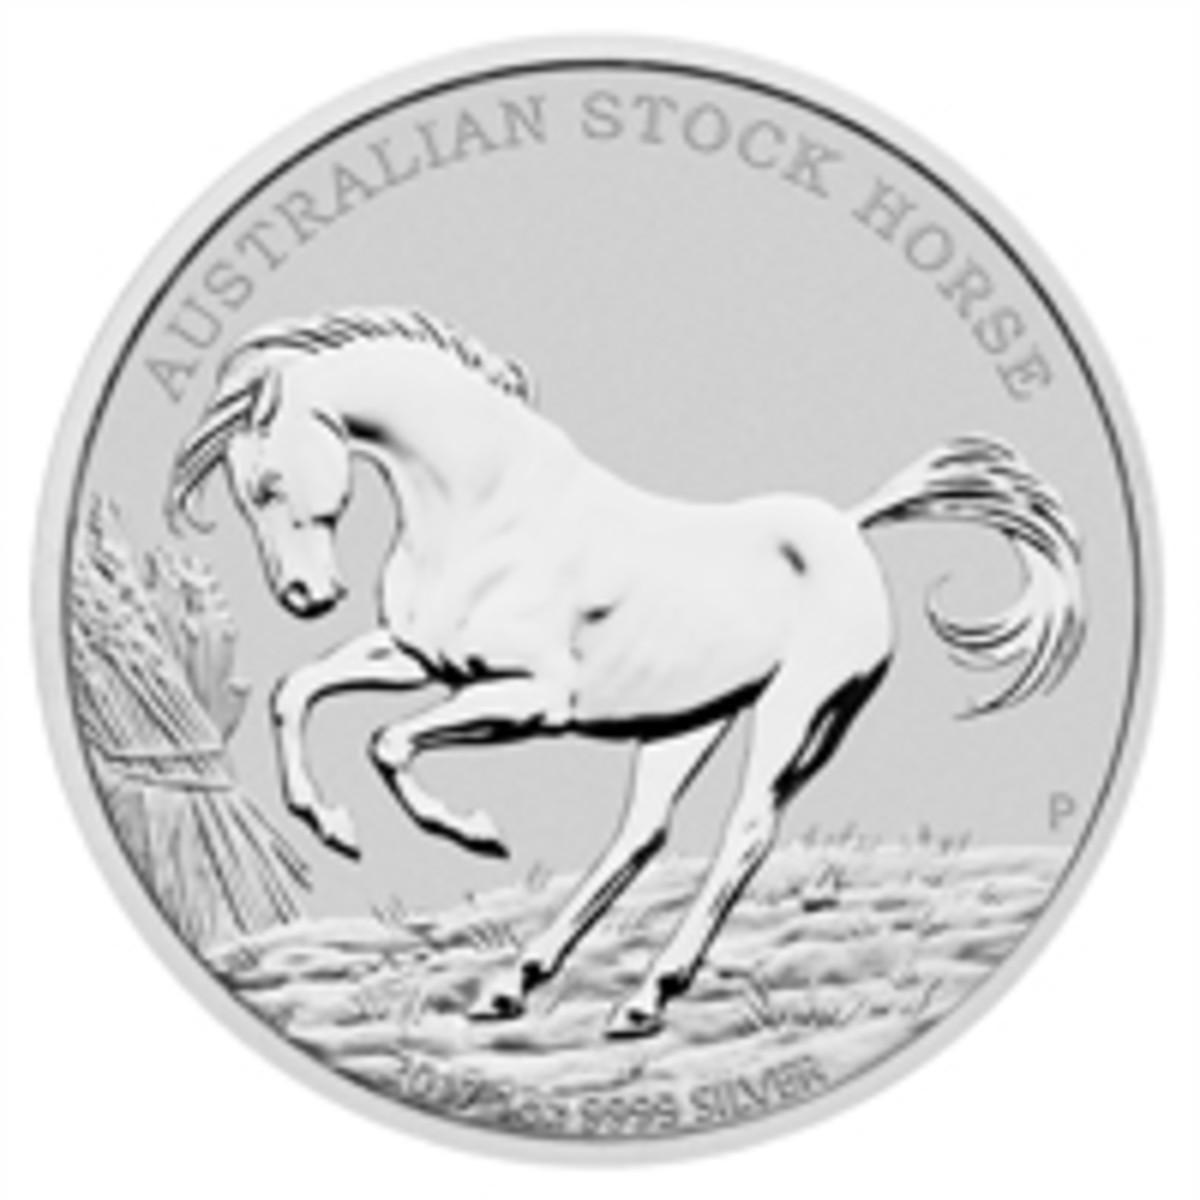 Jennifer McKenna's 2017 reverse design of the silver bullion $1 featuring a frisky Australian Stock Horse. (Image courtesy The Perth Mint)